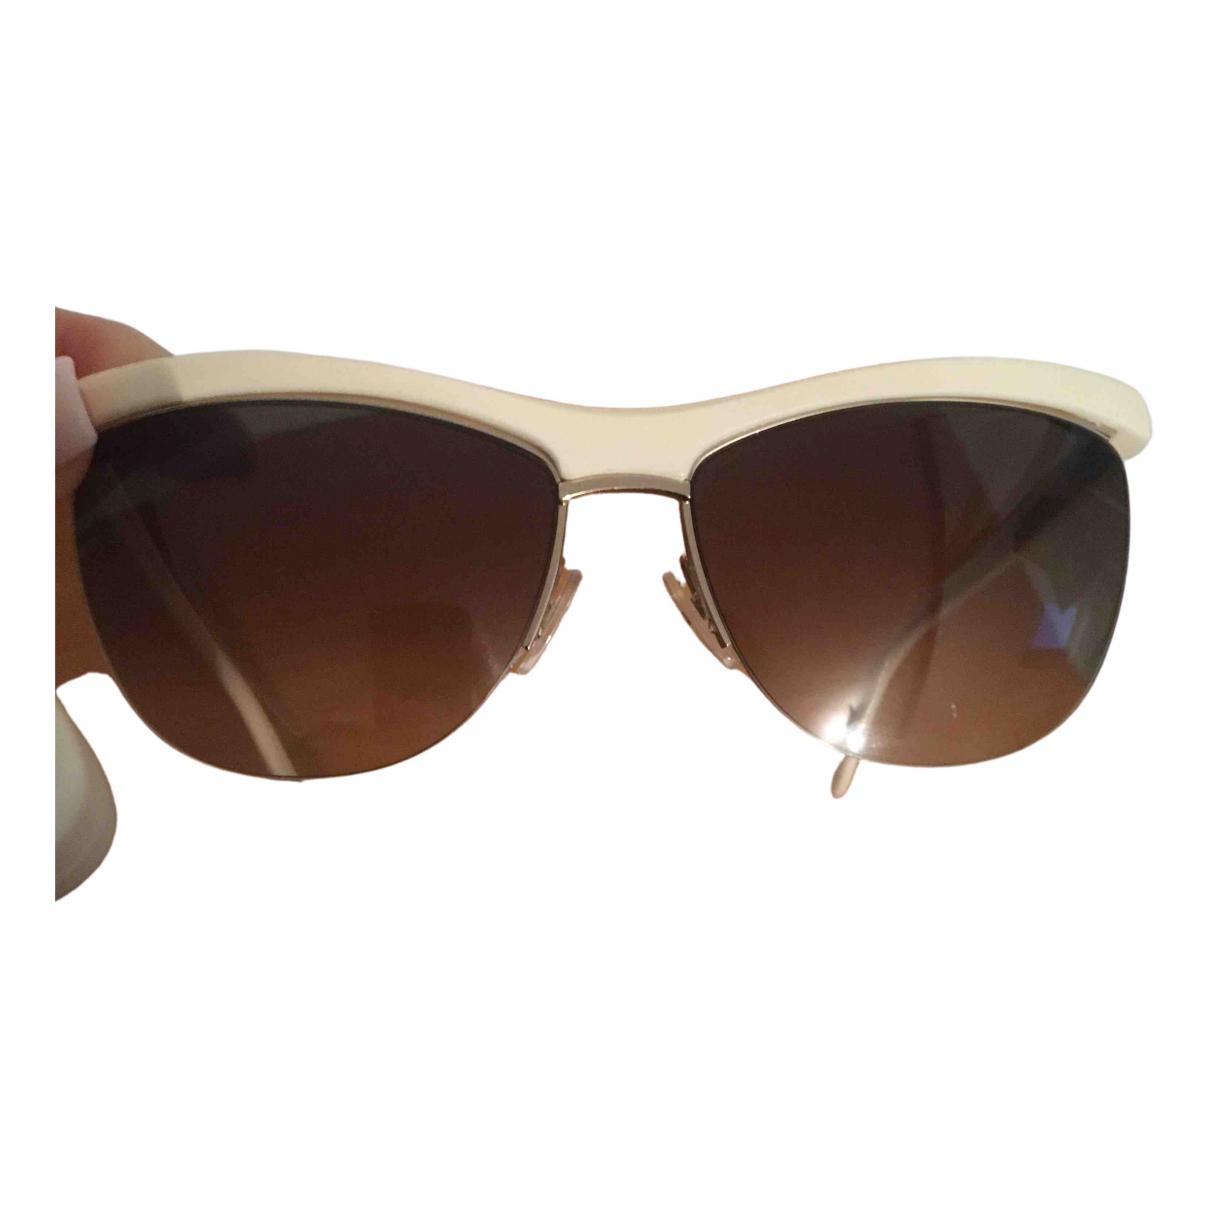 Marc Jacobs \N Beige Sunglasses for Women \N